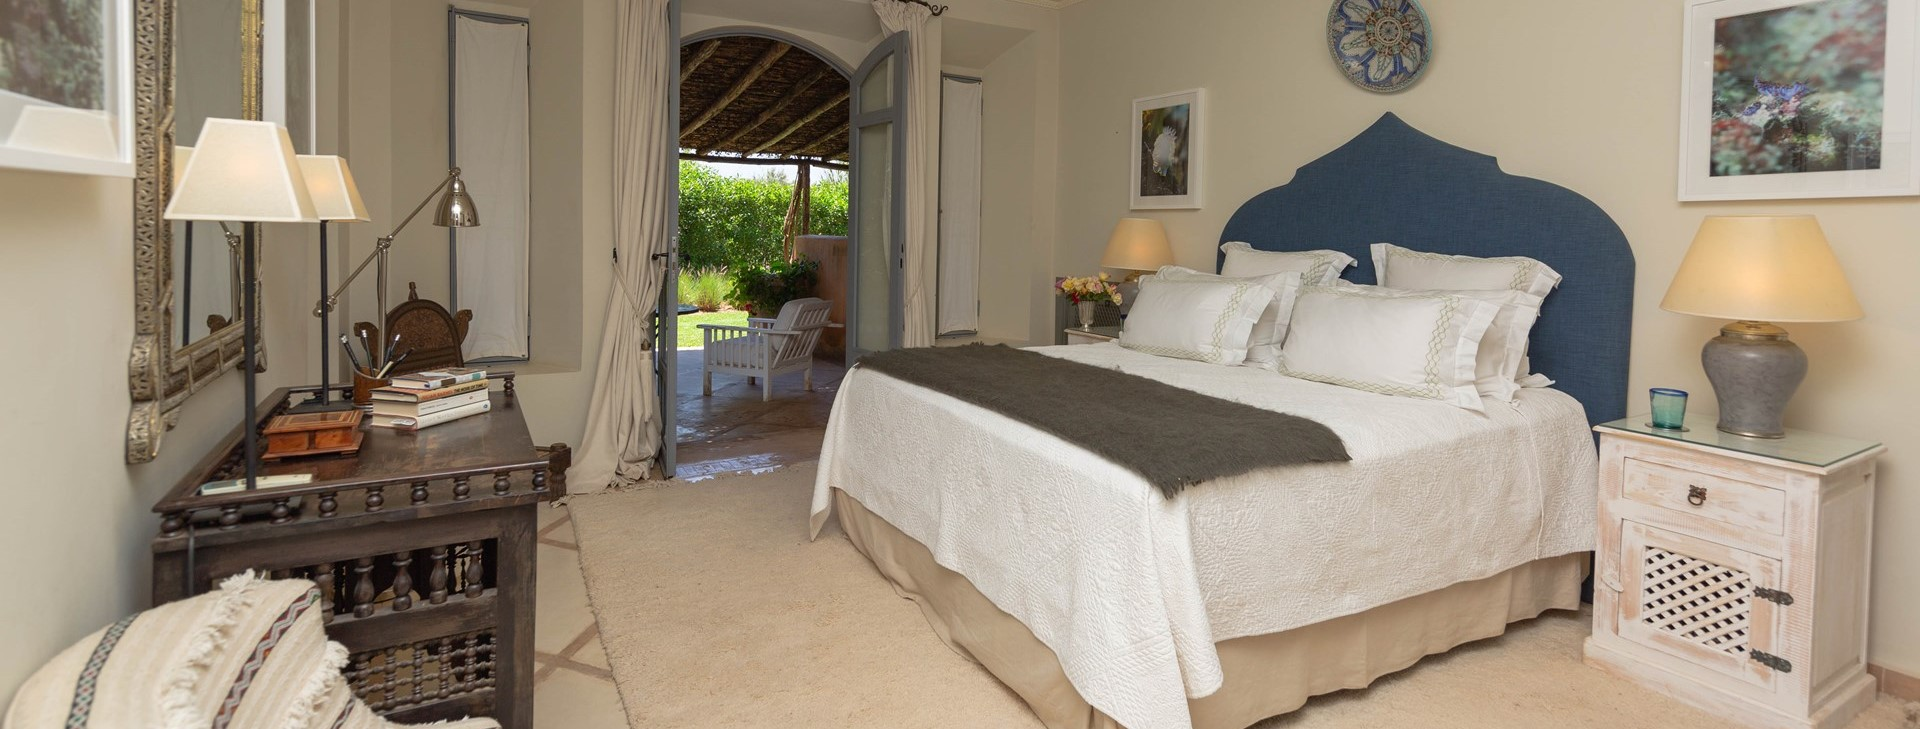 villa-dar-tourtite-double-bedroom-2